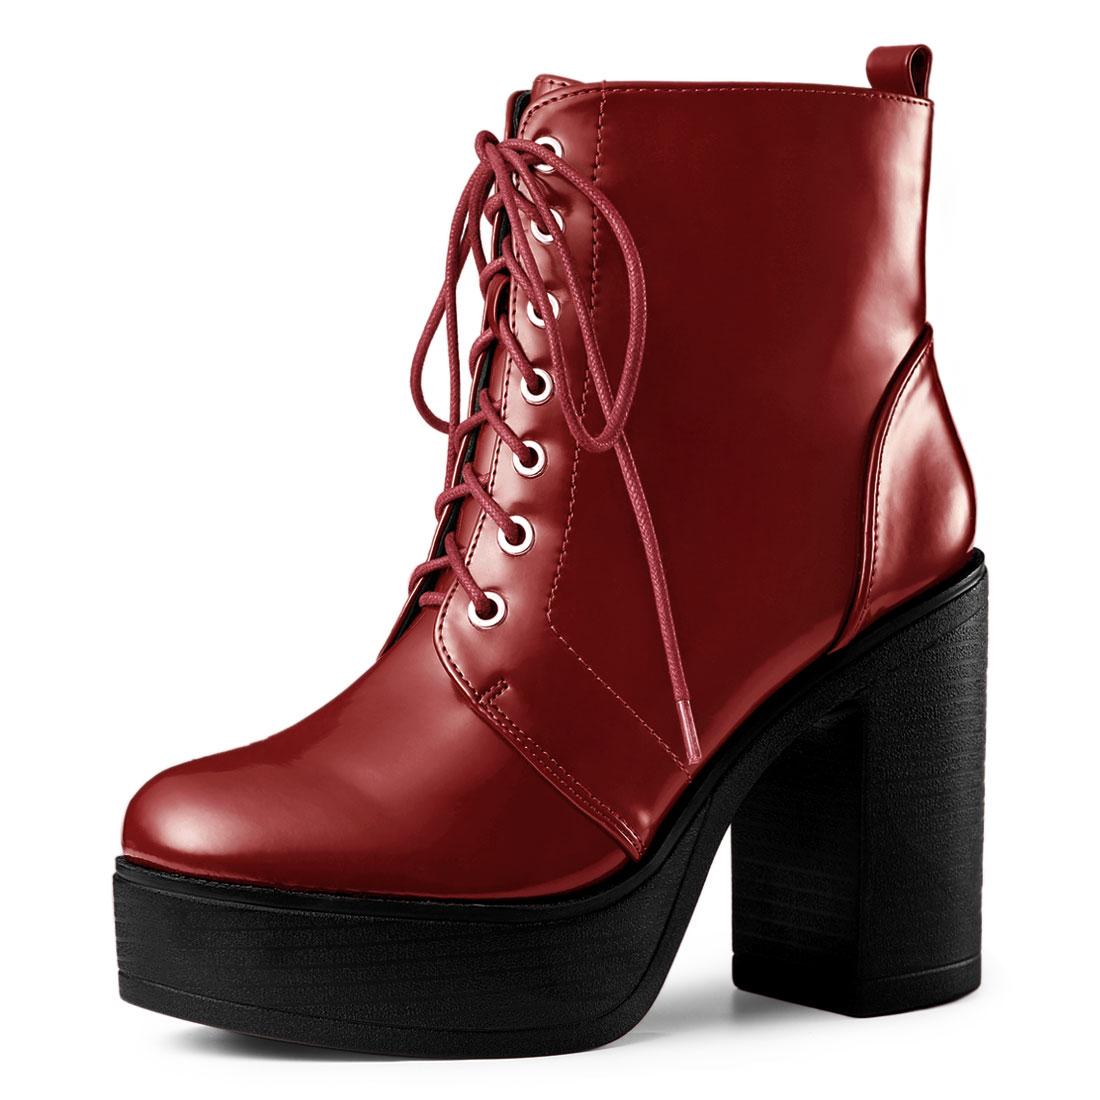 Allegra K Women's Platform Chunky High Heel Lace Up Combat Boots Red US 7.5